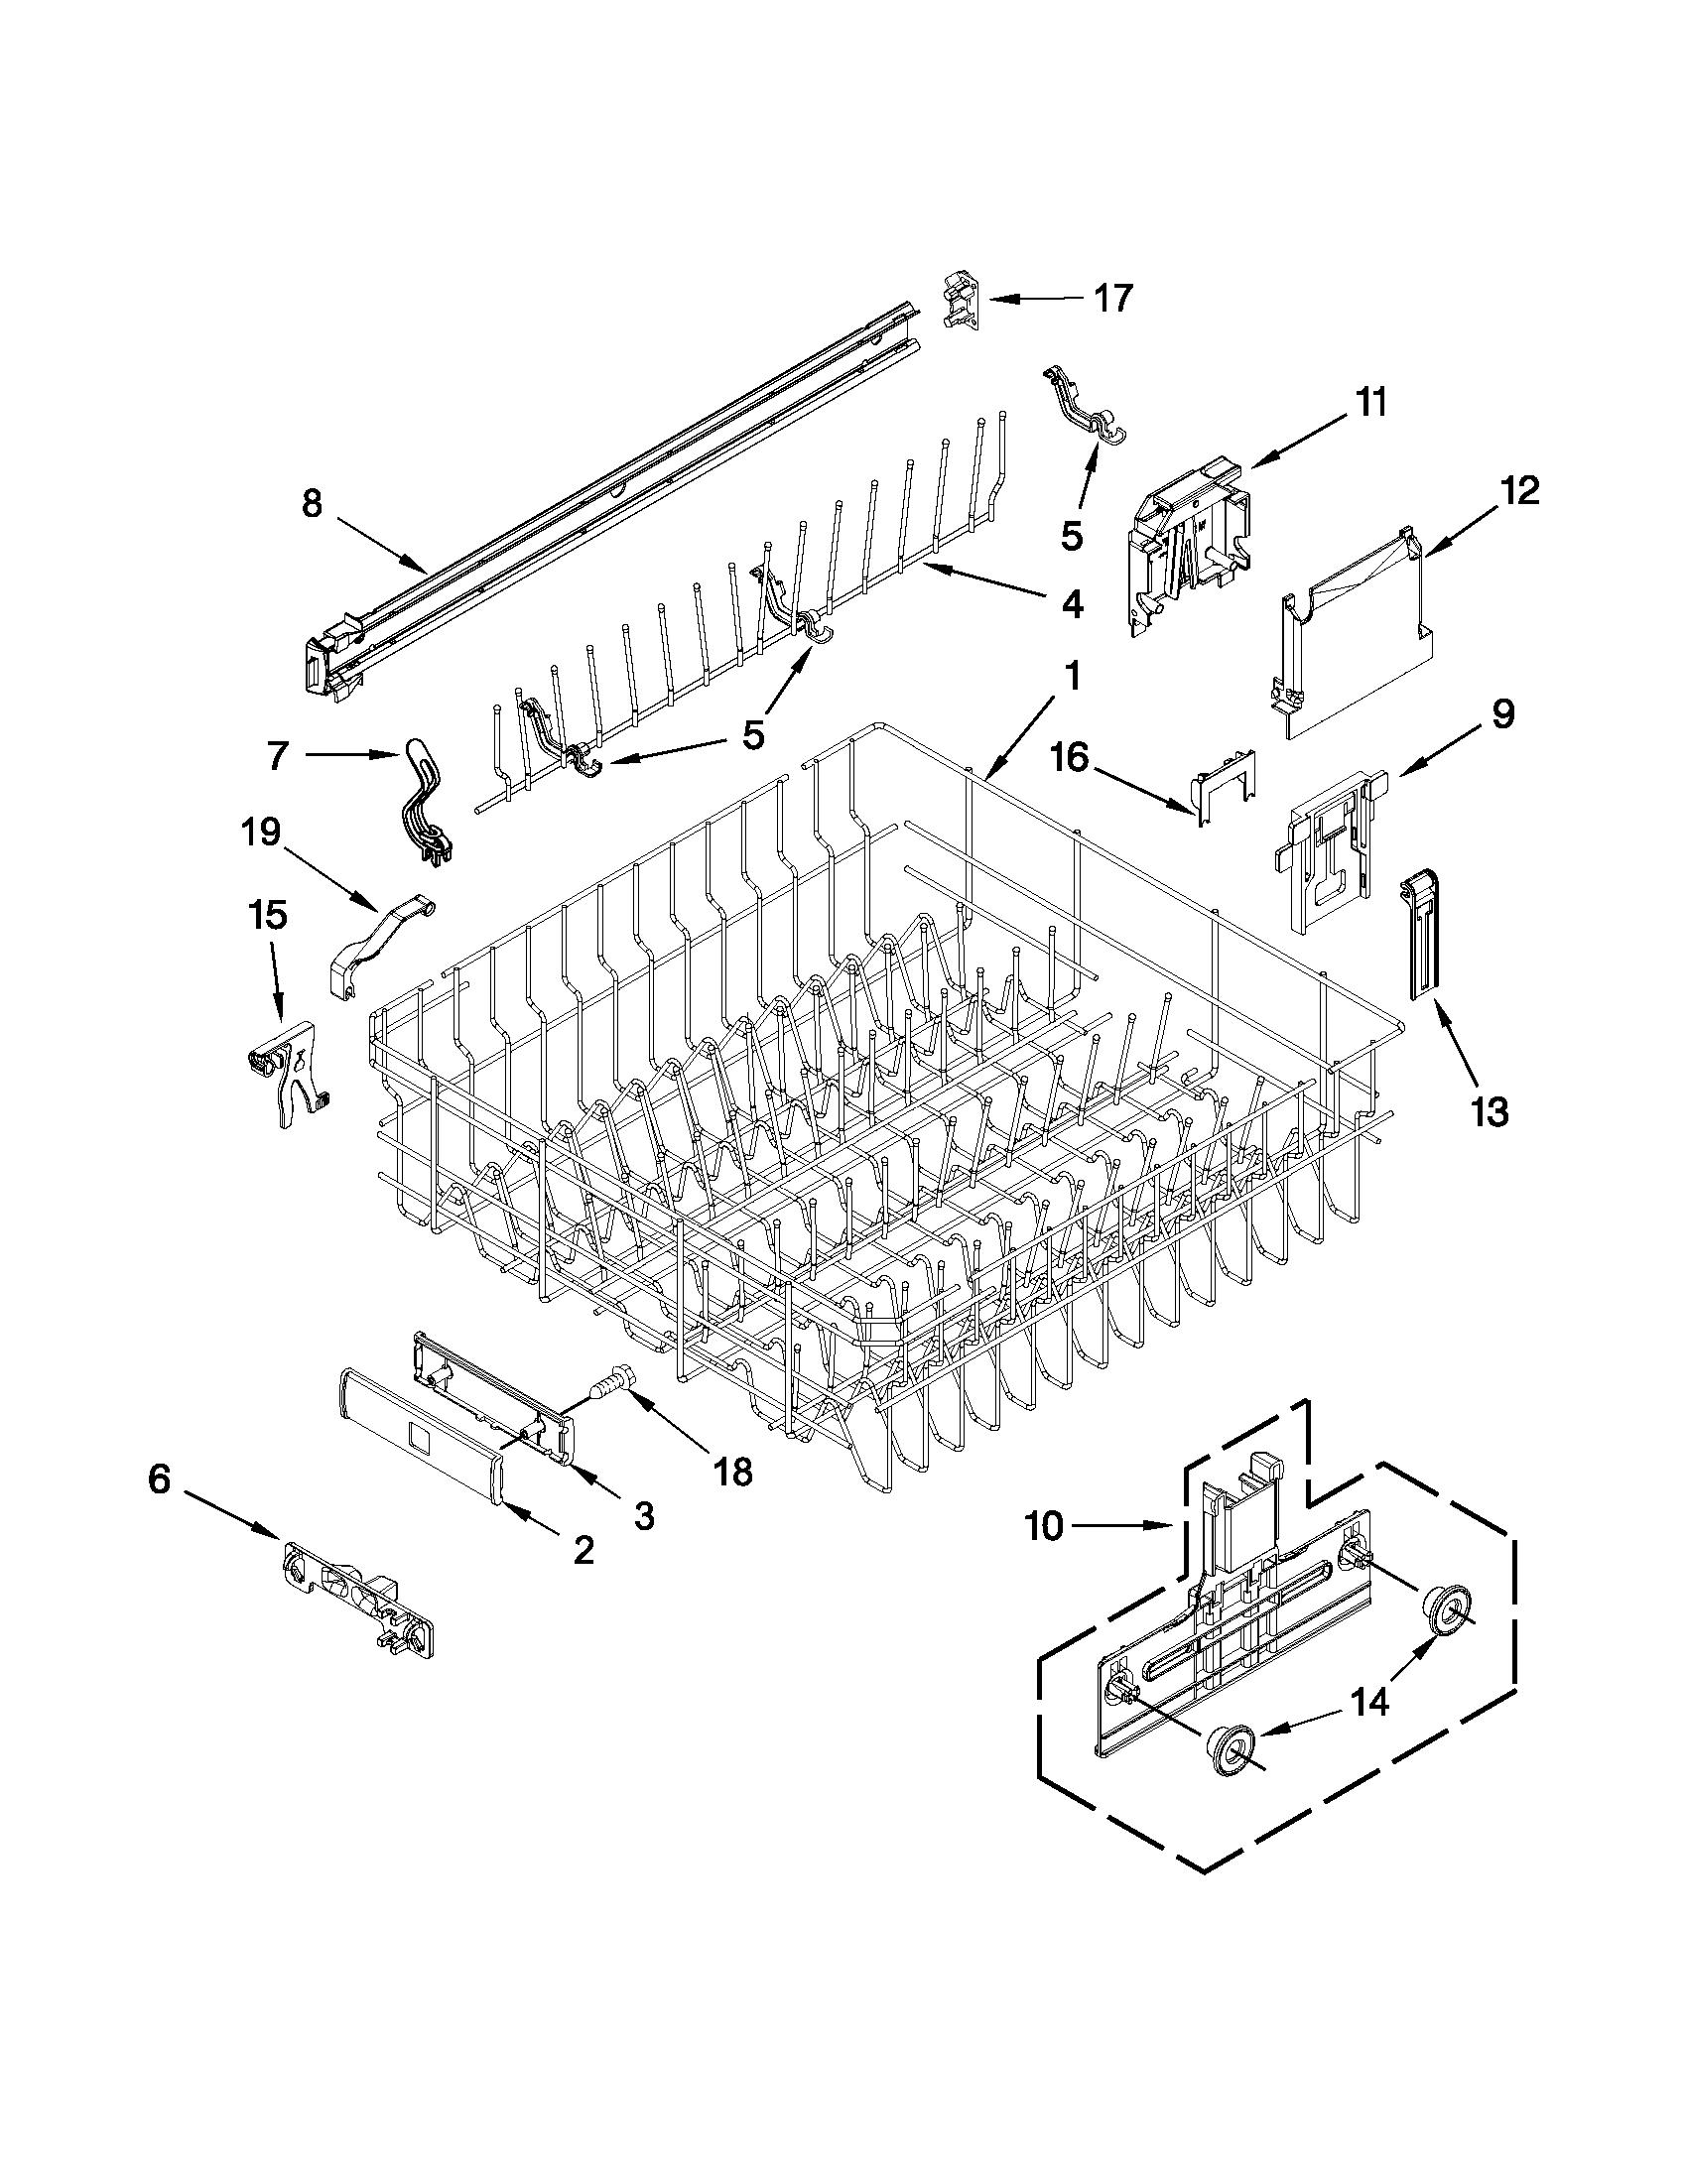 medium resolution of wiring diagram for kenmore elite dishwasher data schematic diagram kenmore elite dishwasher model 66512769k310 upper rack